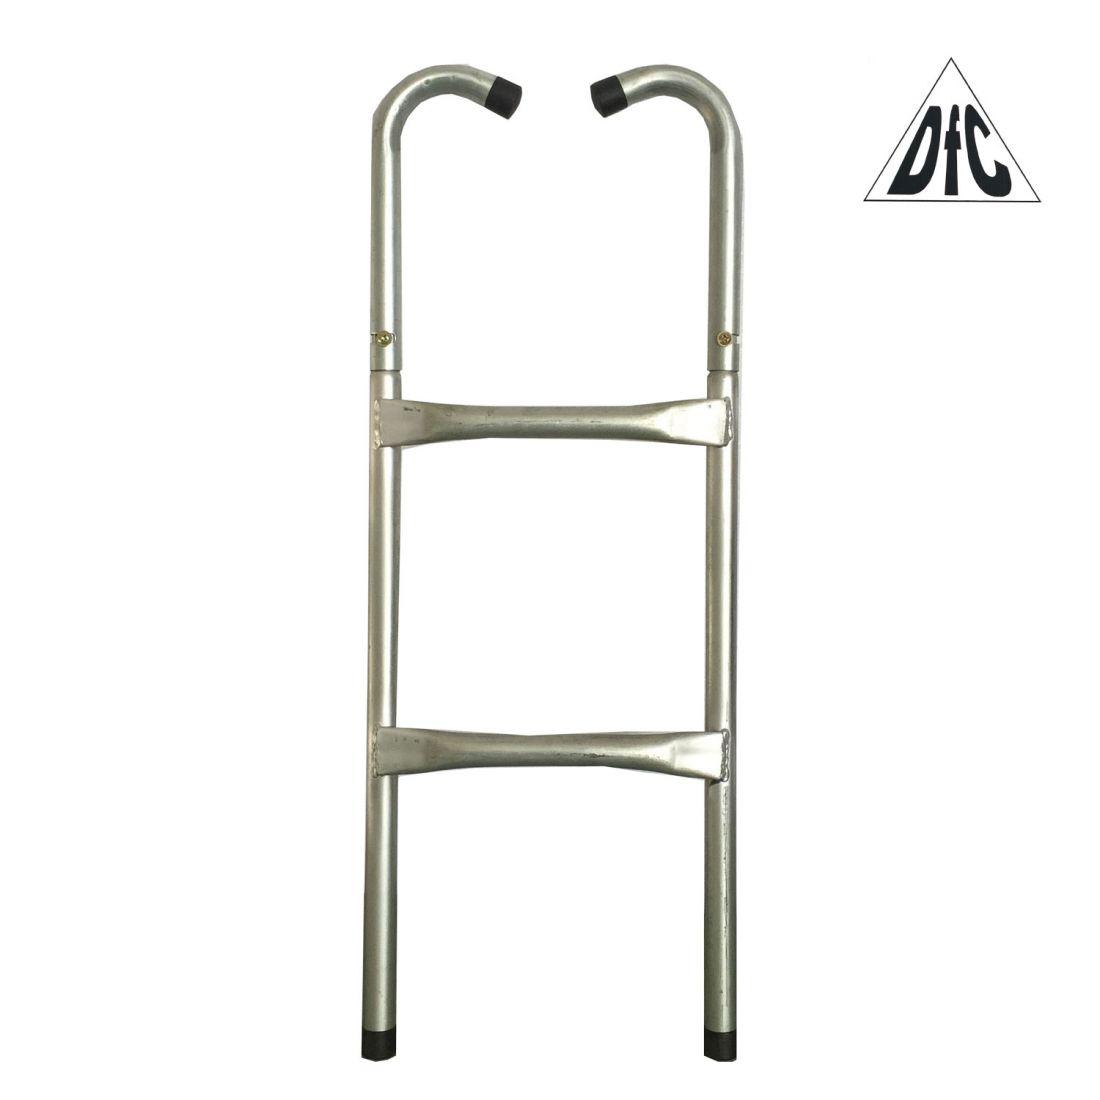 Лестница для батута 6-10 футов - DFC 2ST-L